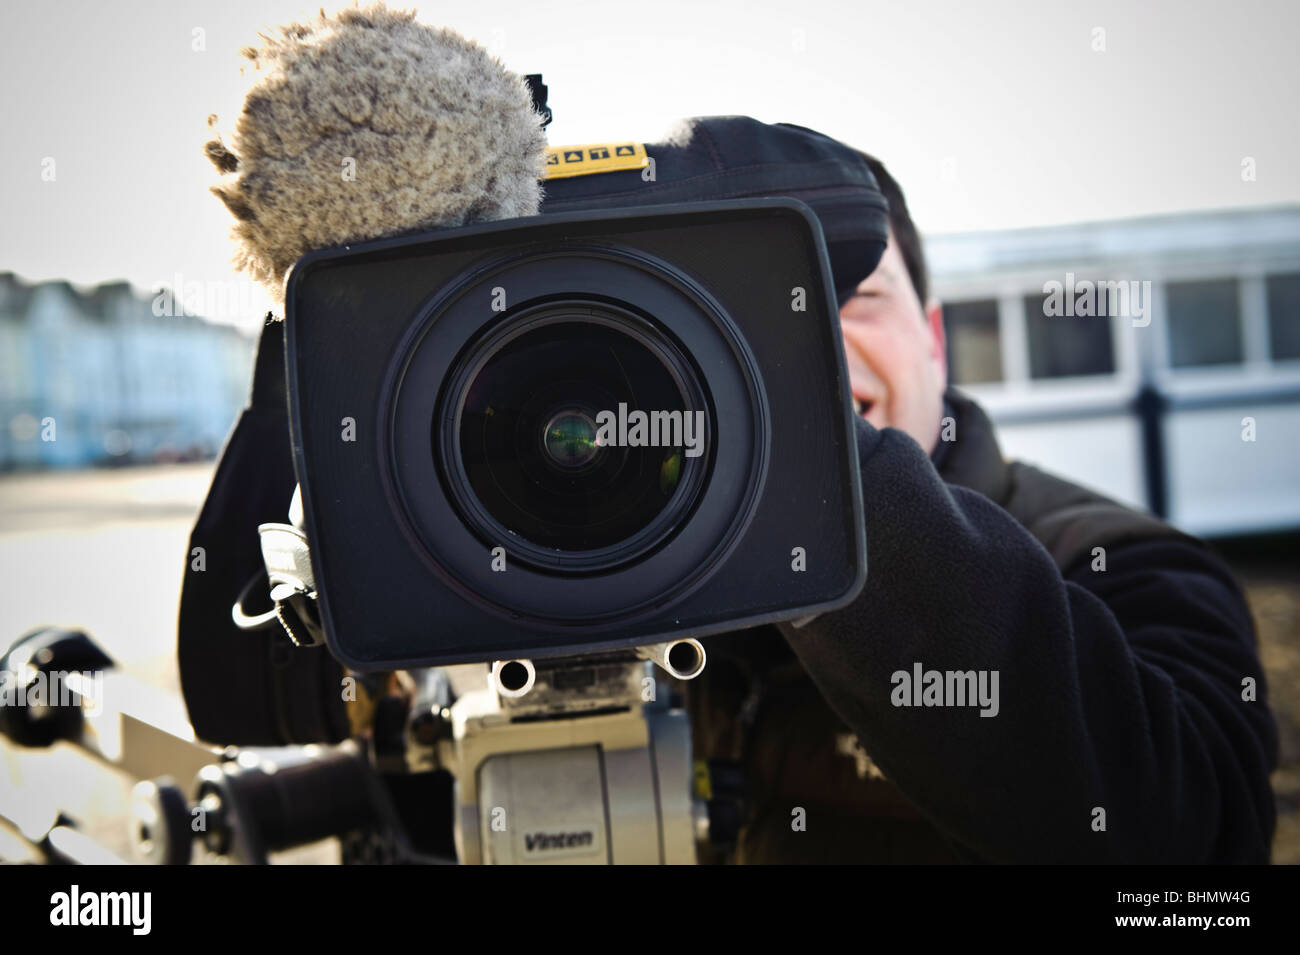 tv film crew recording news item - close up of video camera lens and cameraman - Stock Image